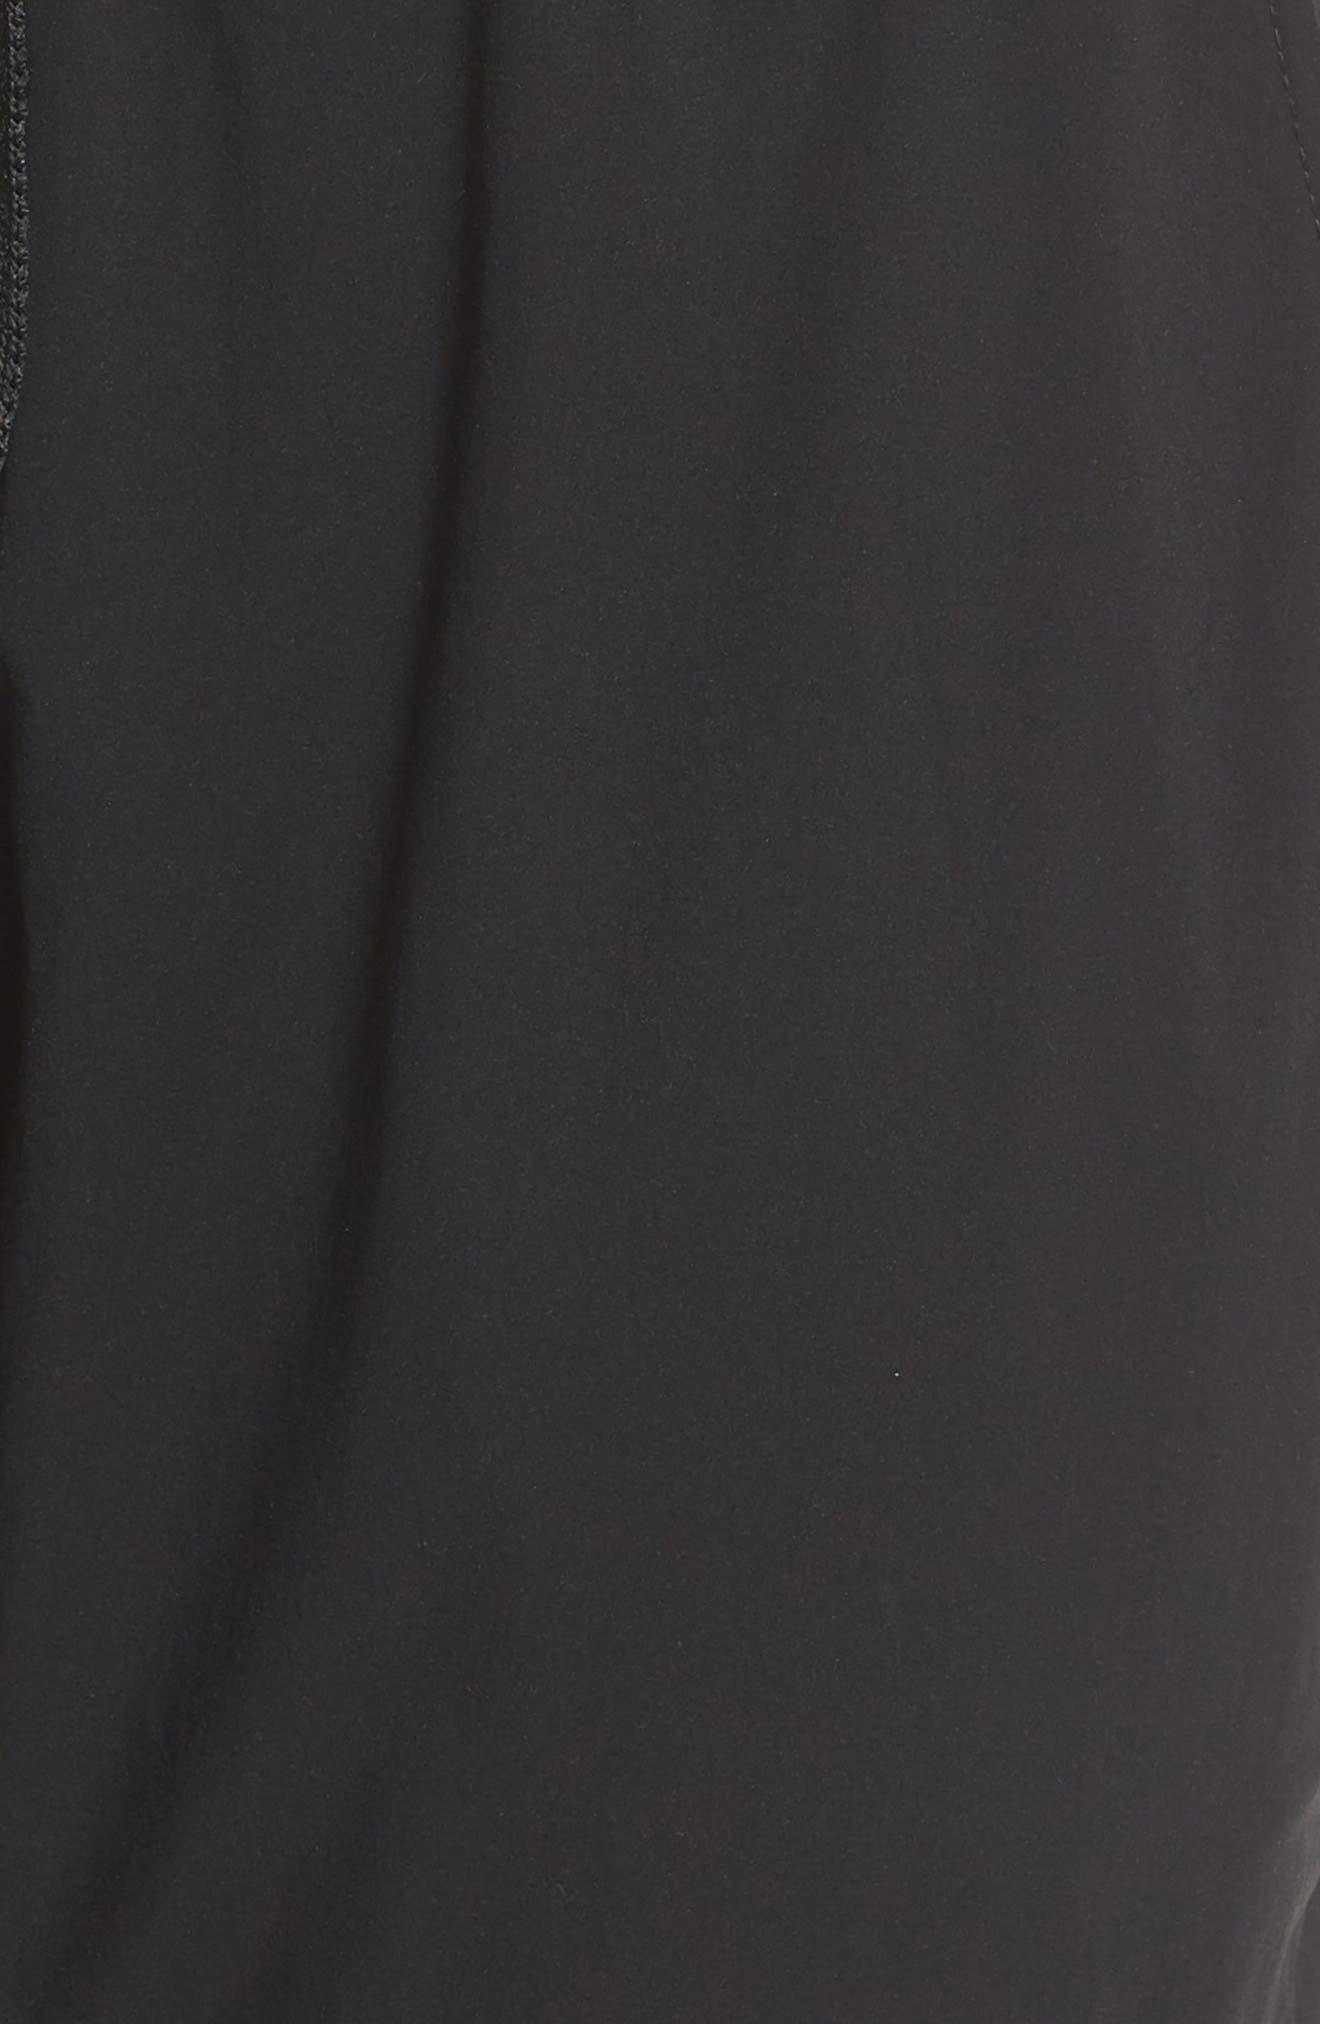 Cardio Harem Pants,                             Alternate thumbnail 6, color,                             Black